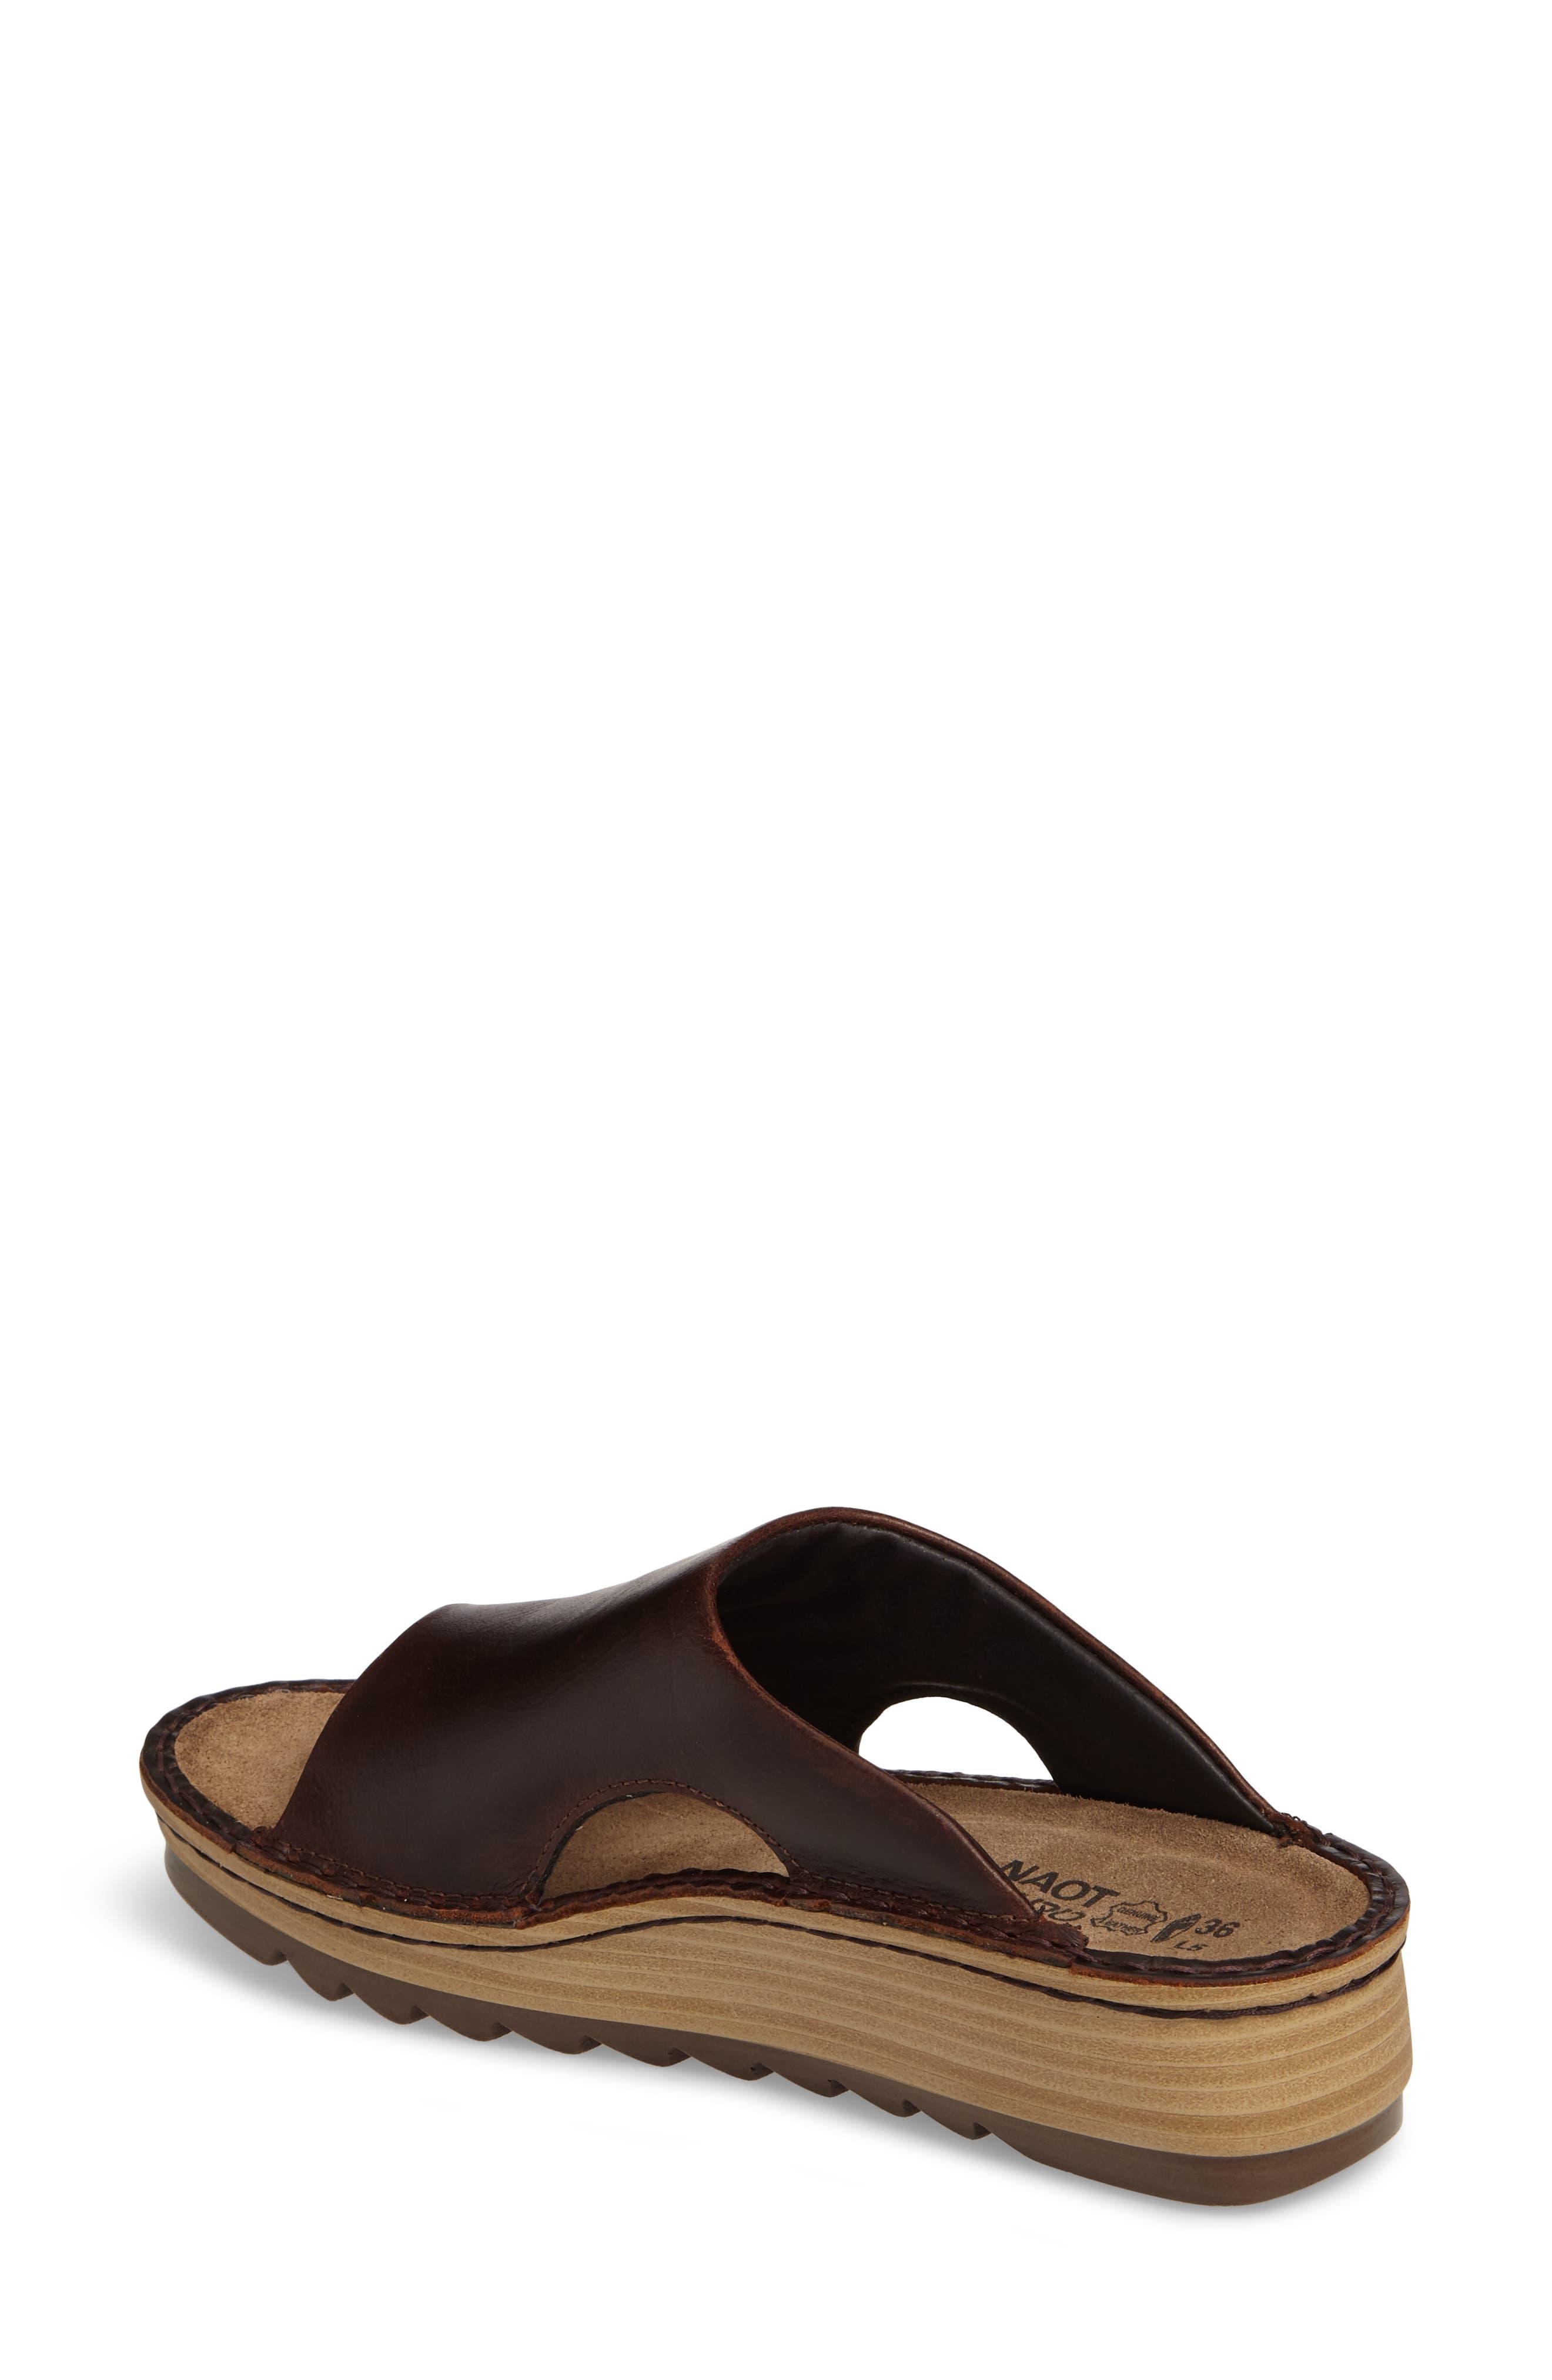 'Ardisia' Slide Sandal,                             Alternate thumbnail 2, color,                             Buffalo Leather